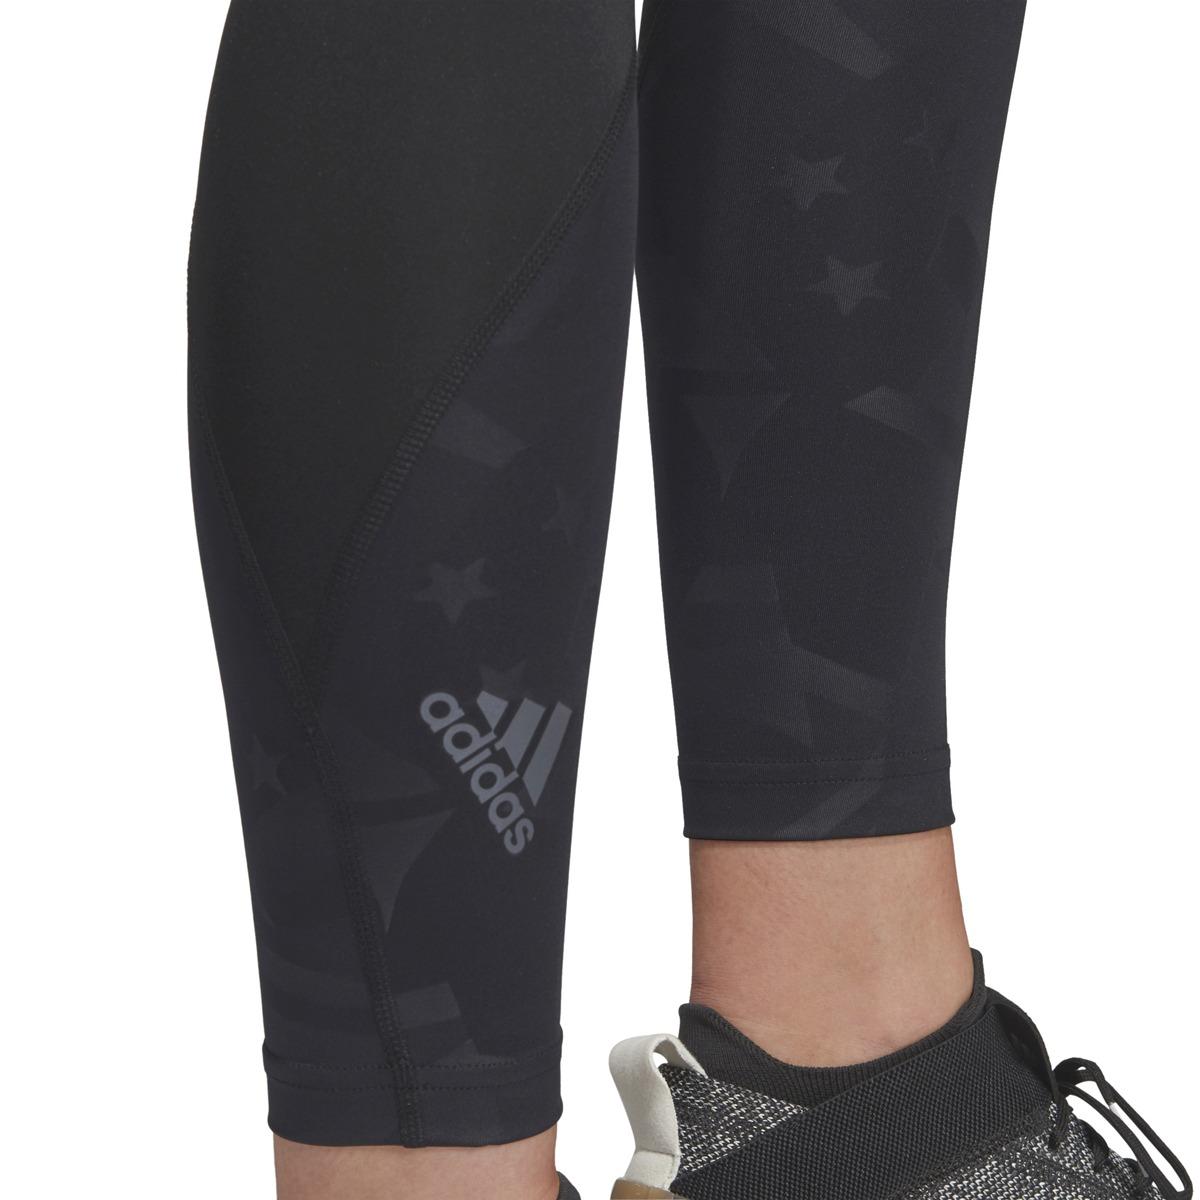 1faa07a83dbe3 calza adidas training alphaskin sport 2.0 mujer ng rv. Cargando zoom.